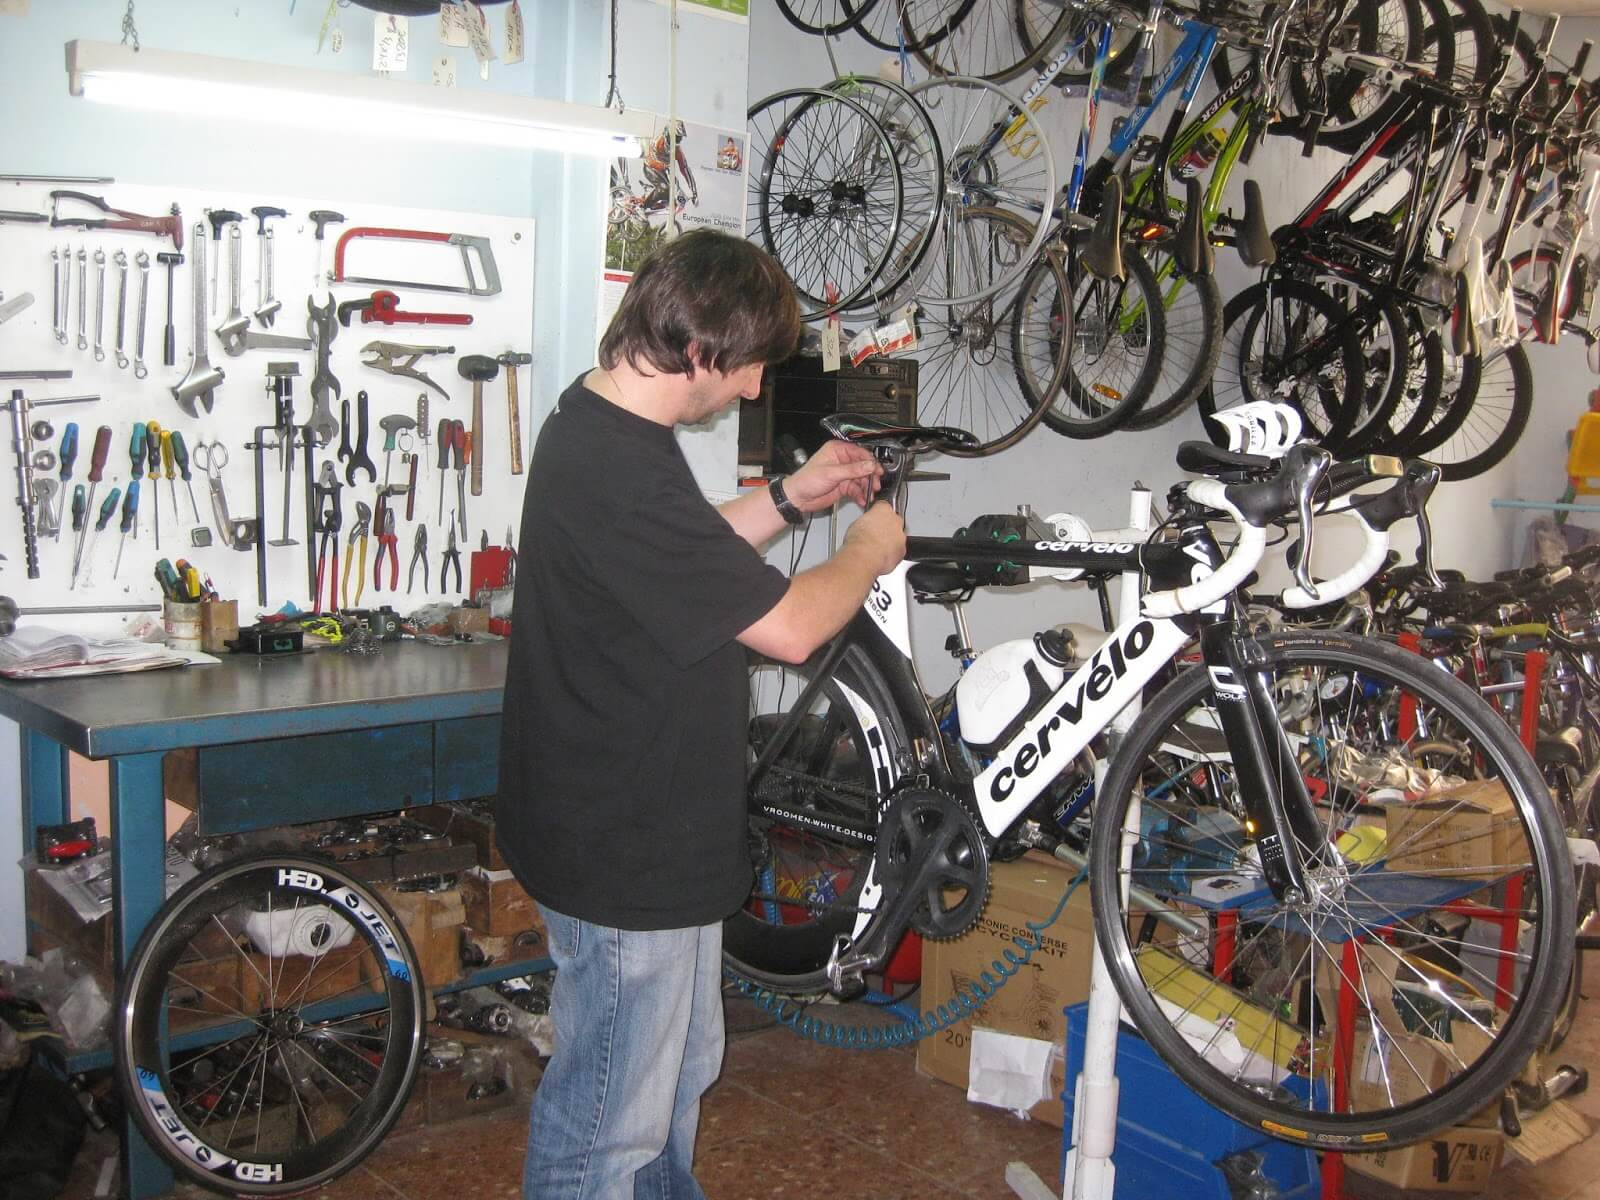 Abrir un taller de reparación de bicicletas - Ideas rentables en ...